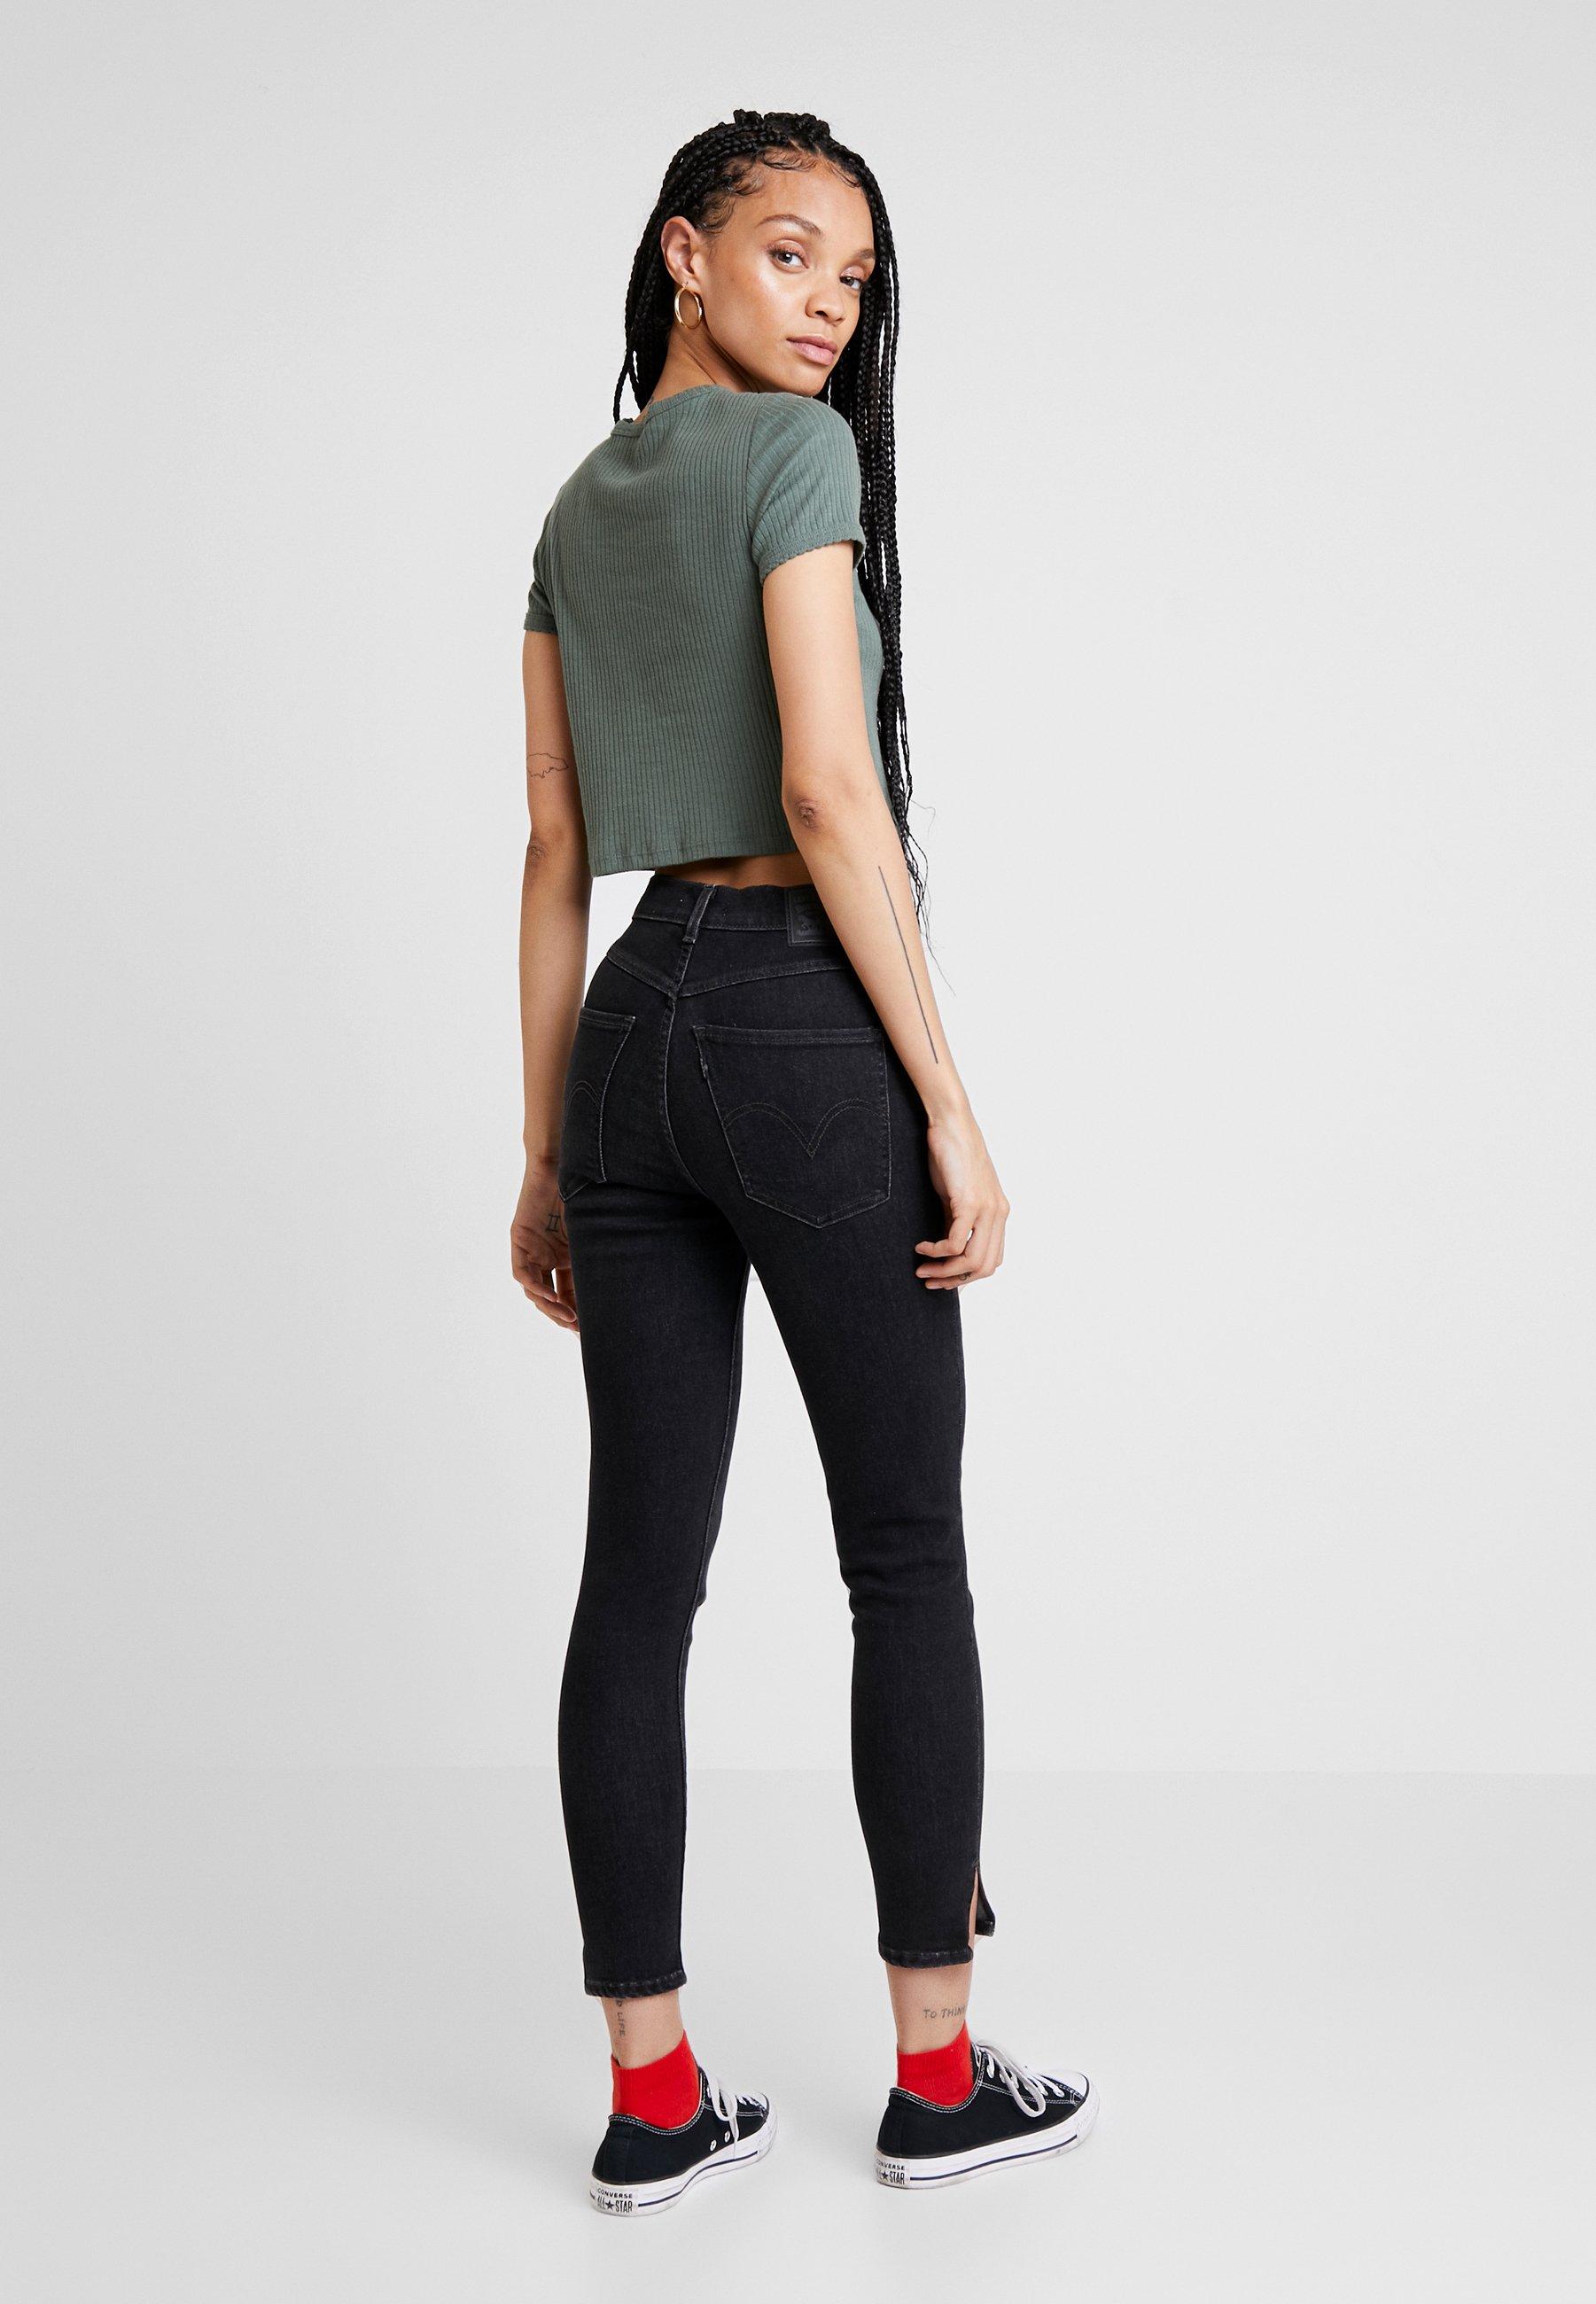 Levi's® MILE HIGH ANKLE YOKE - Jeans Skinny - great wide open - Jeans Femme DO2xY